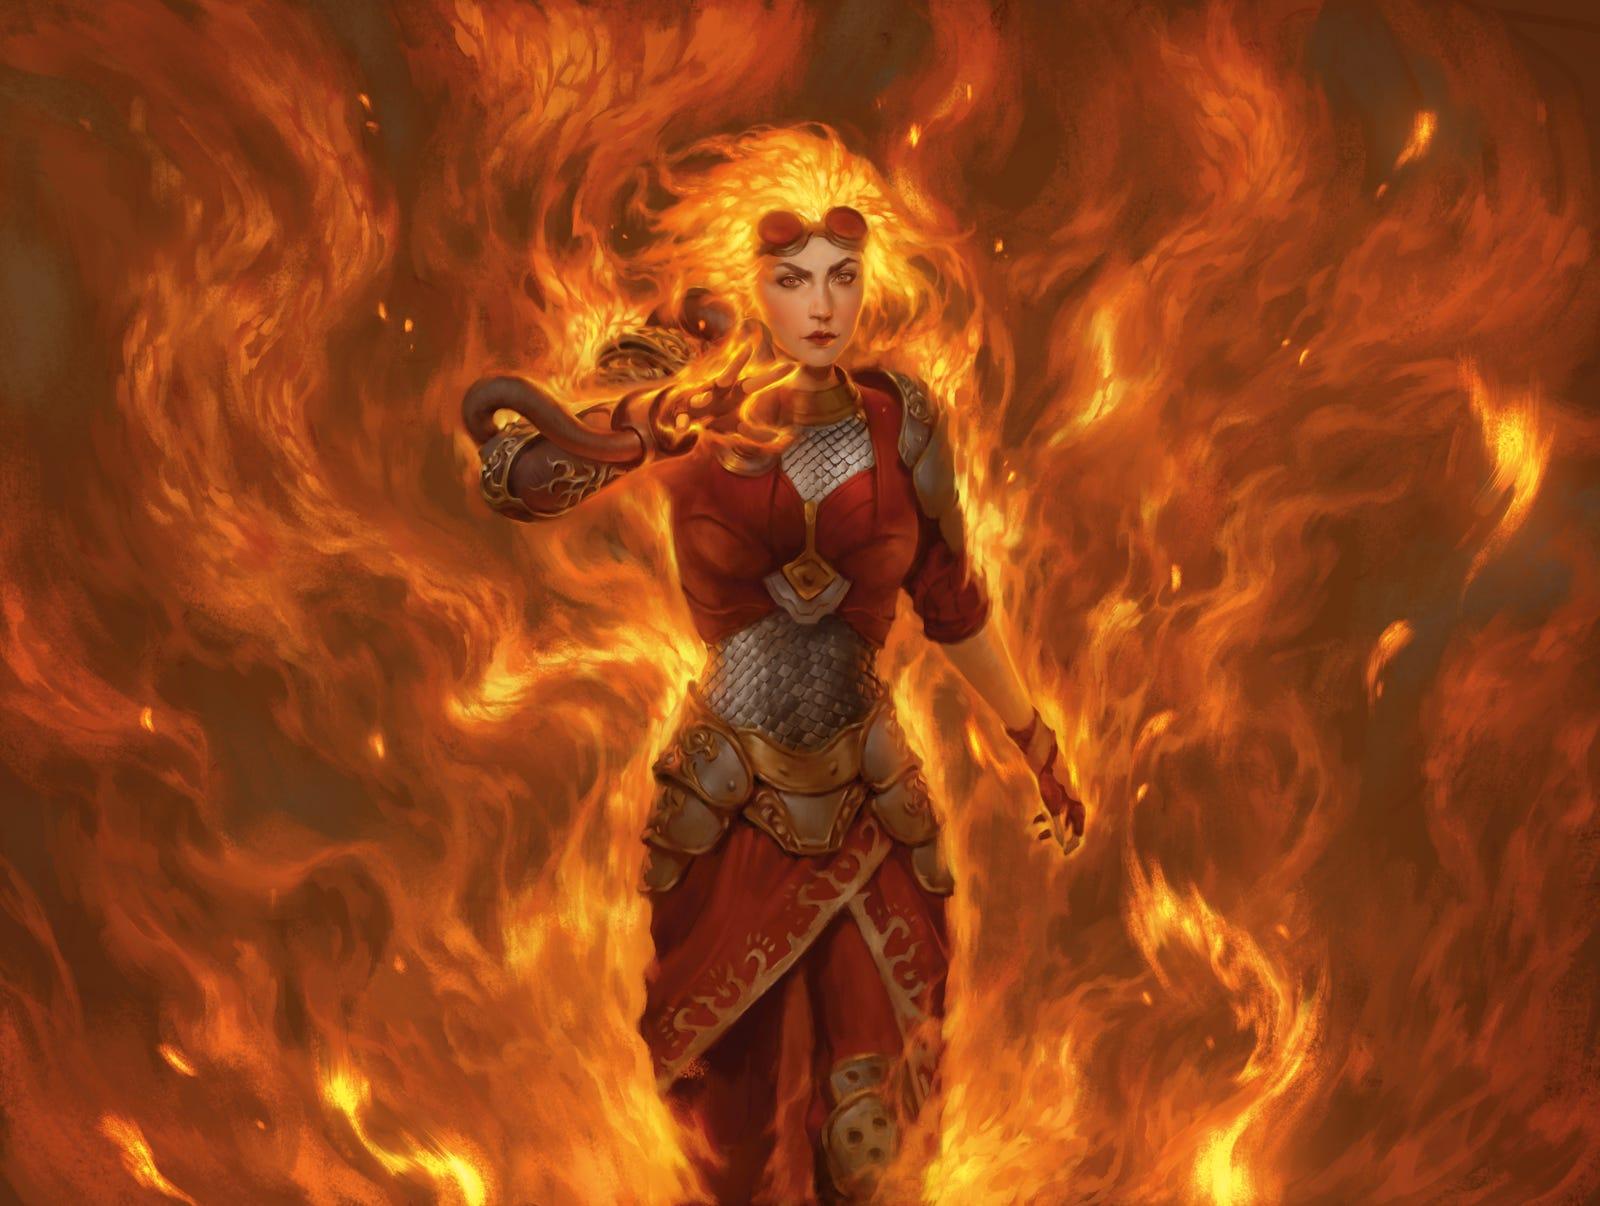 Liberating Combustion